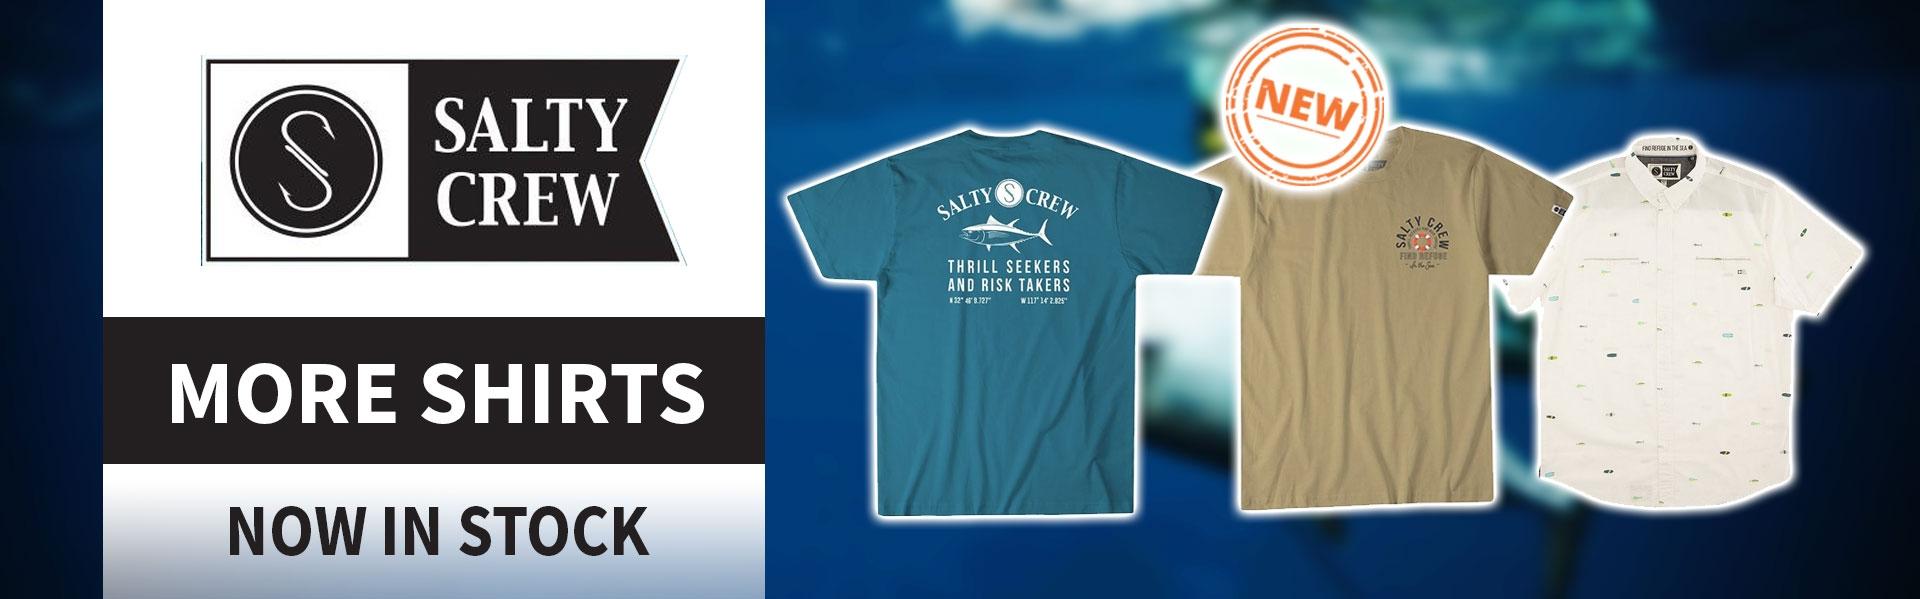 Salty Crew Shirts